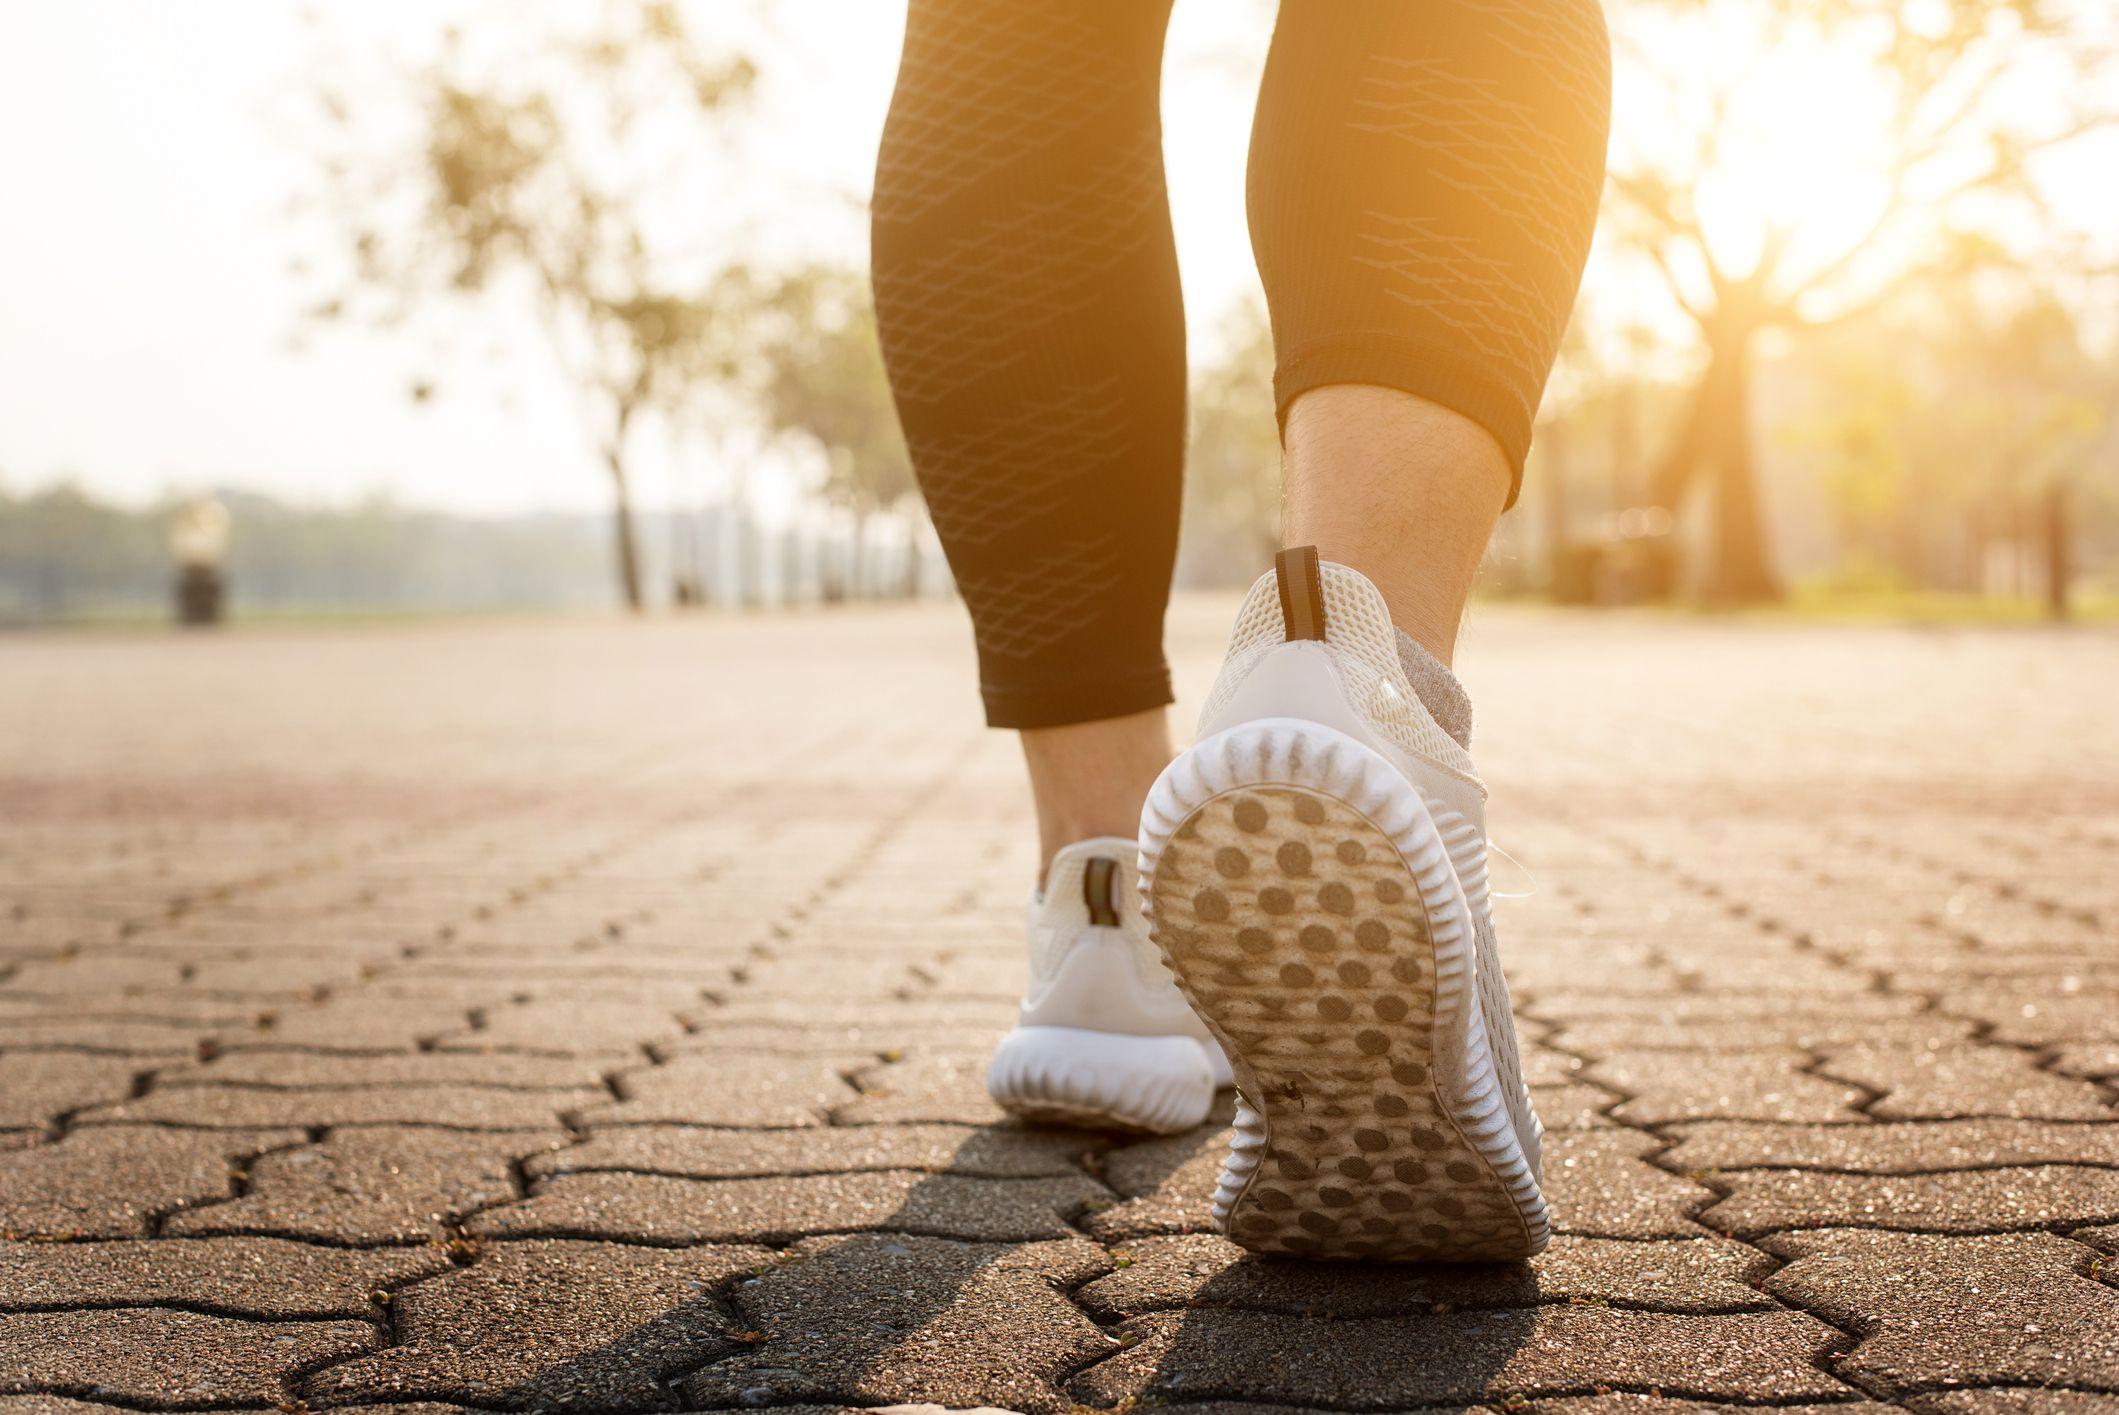 5 Benefits of Walking Outside, Even During Coronavirus